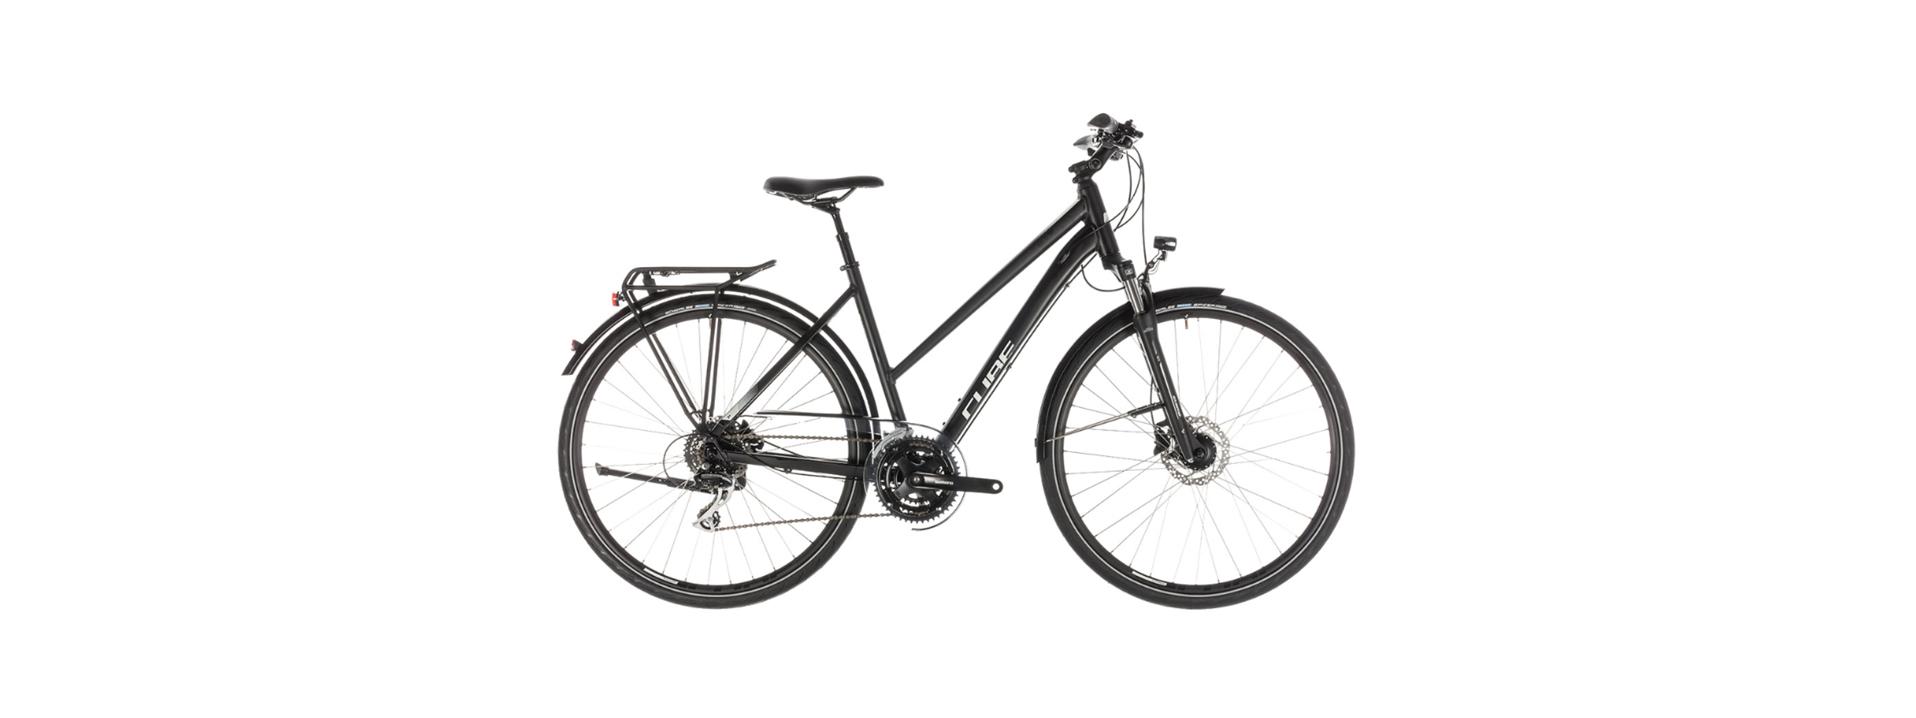 CUBE City bike - Bicicleta conventionala50 lei/zi